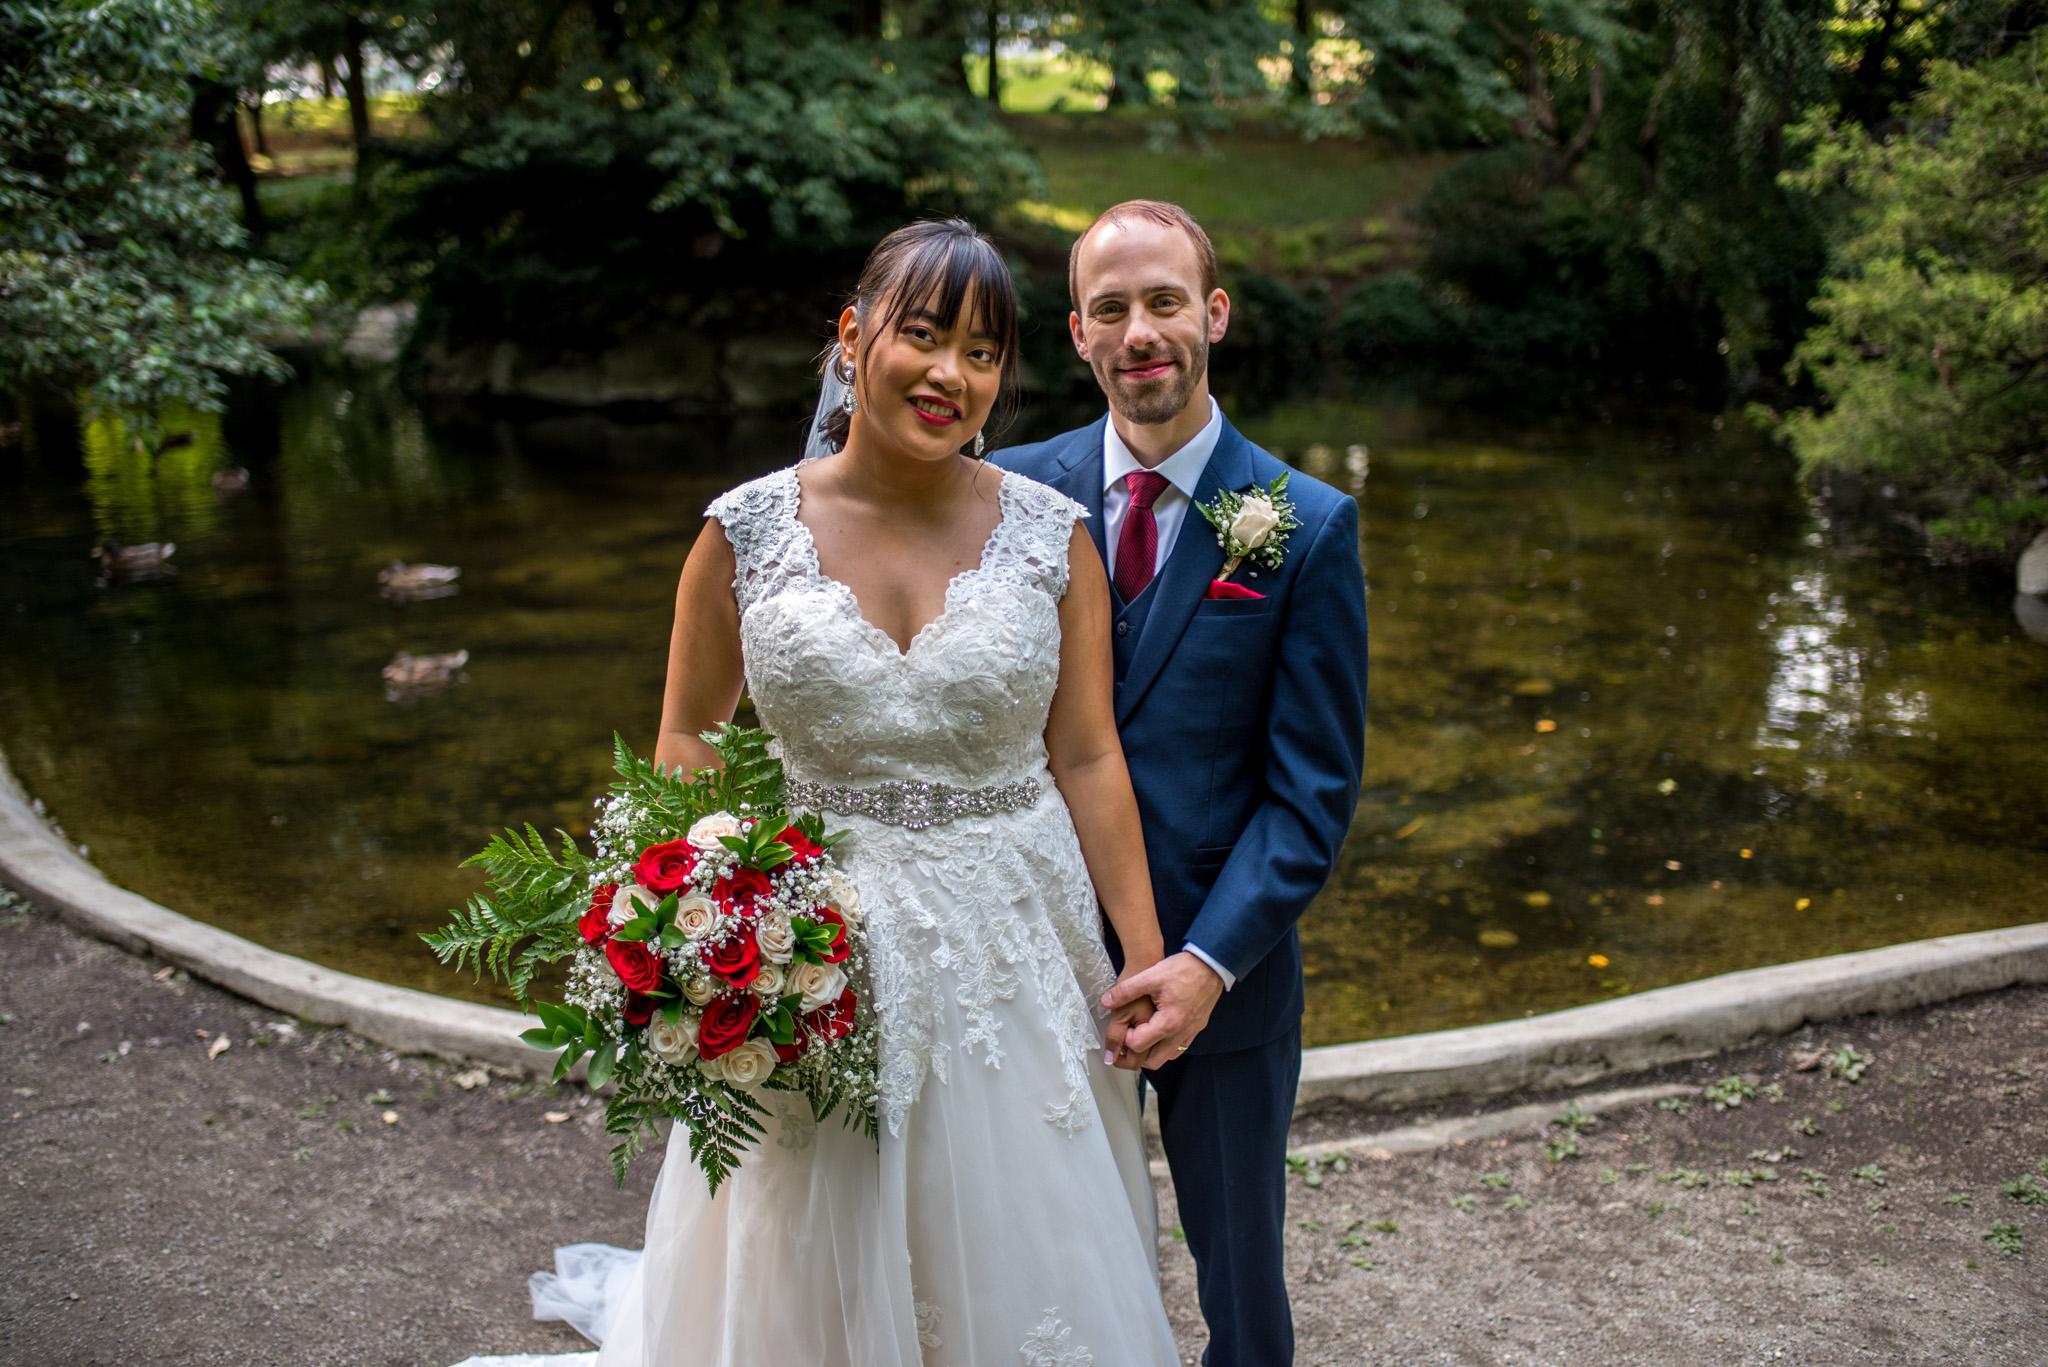 New Westminster Wedding Photographer-51.jpg